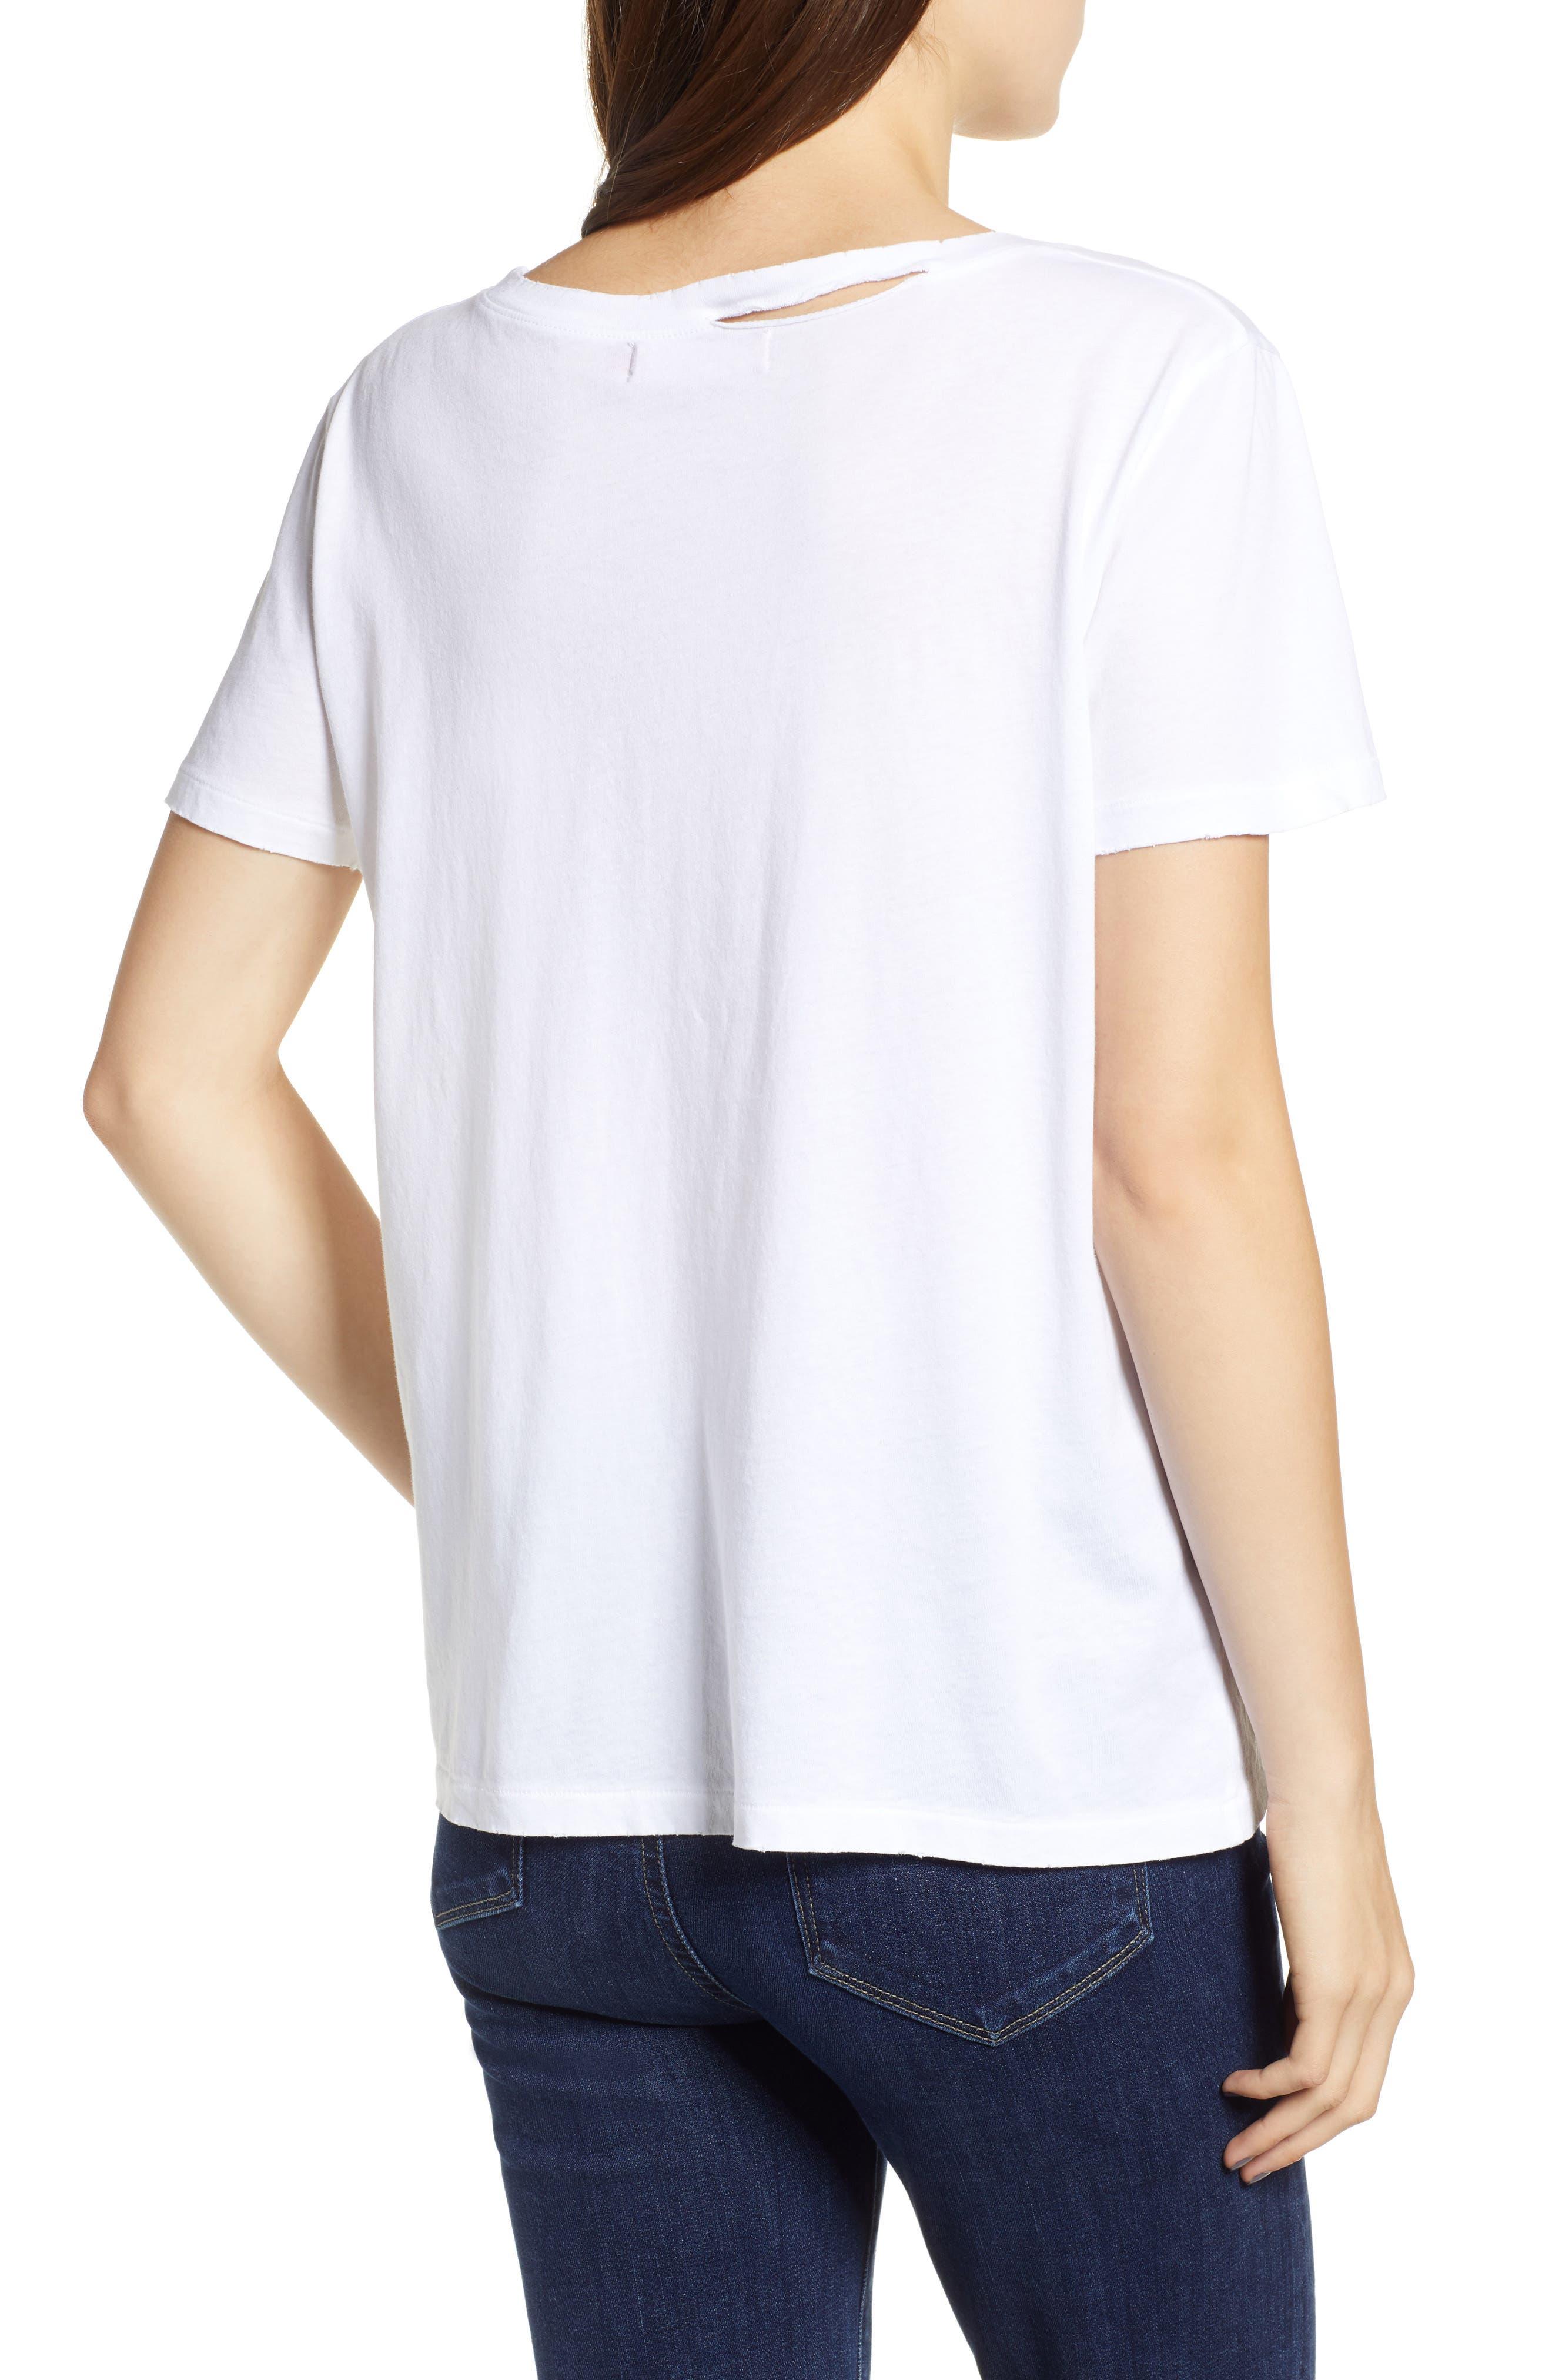 5c44ef30 Women's N:PHILANTHROPY Clothing | Nordstrom